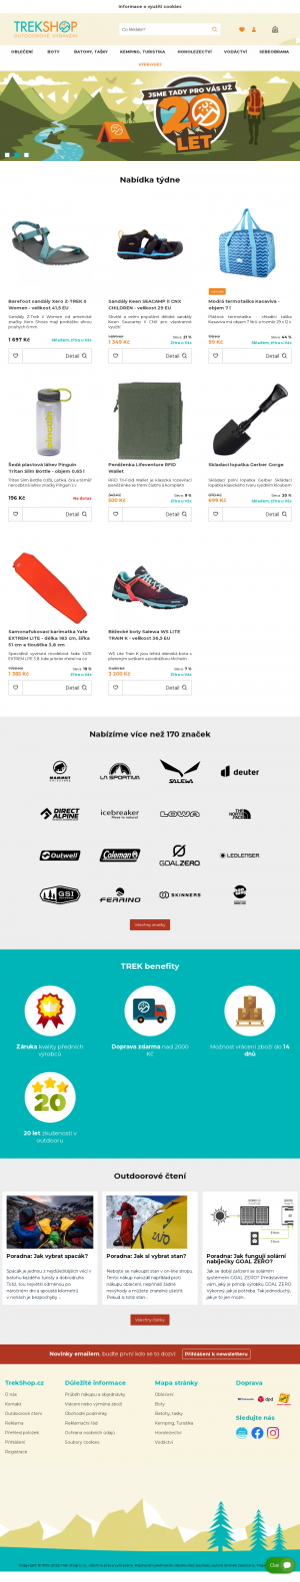 Vzled internetové stránky obchodu Trekshop - outdoorové vybavení